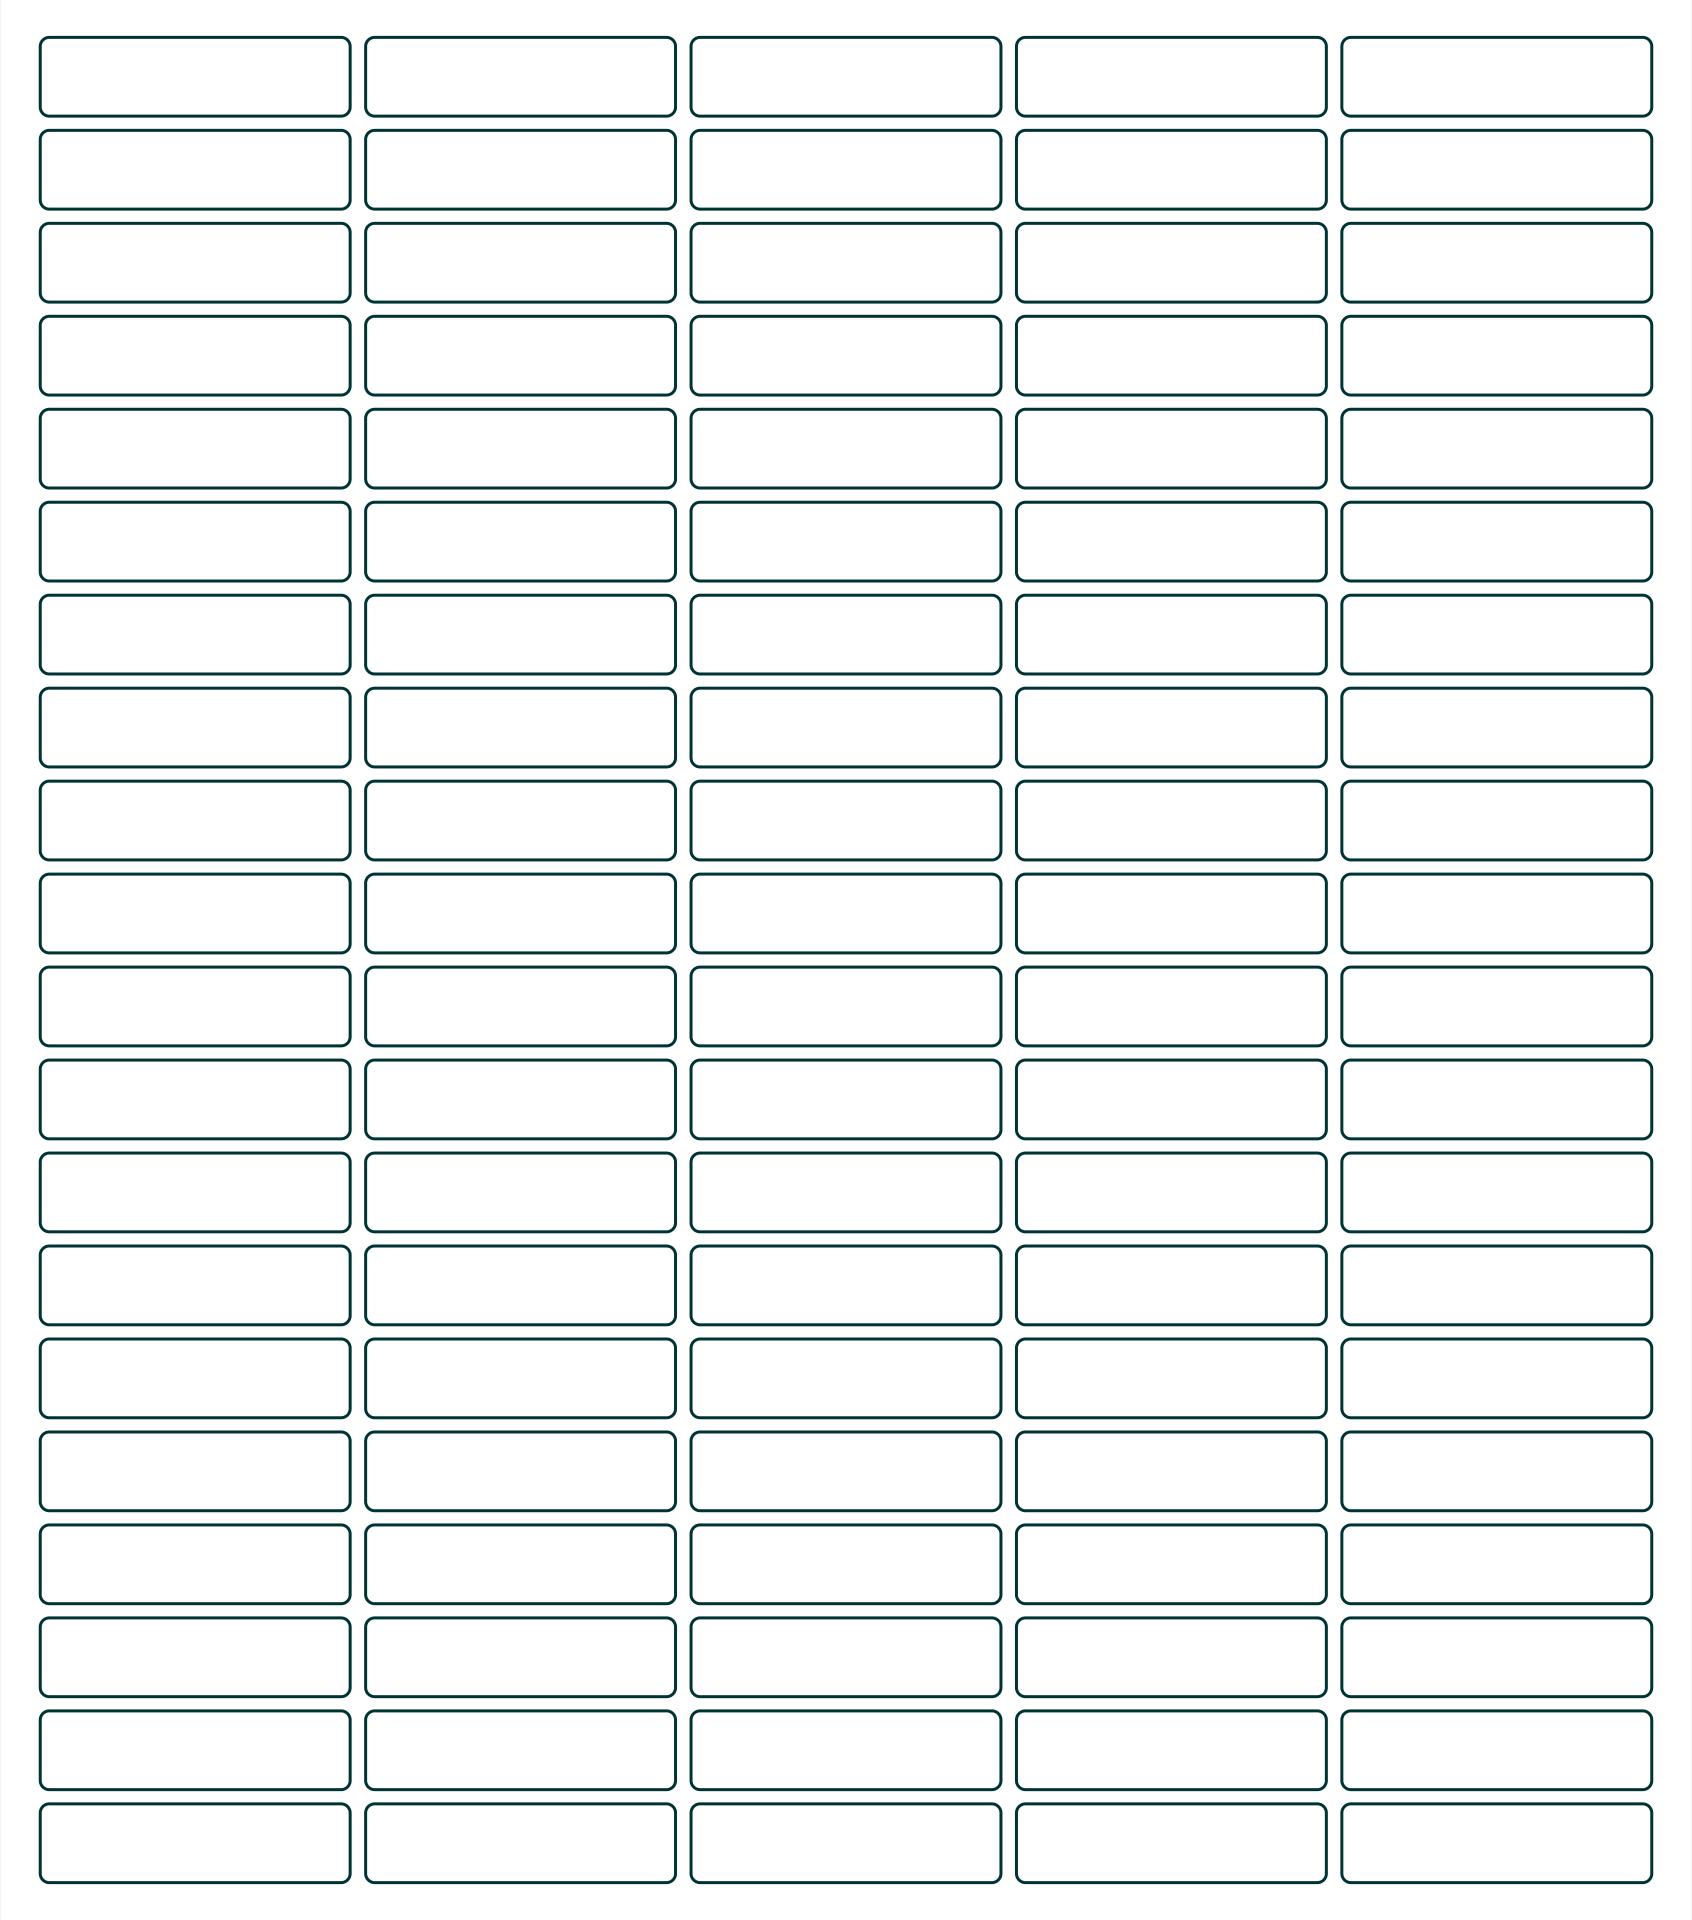 Pendaflex Printable Tab Inserts 5 Tab